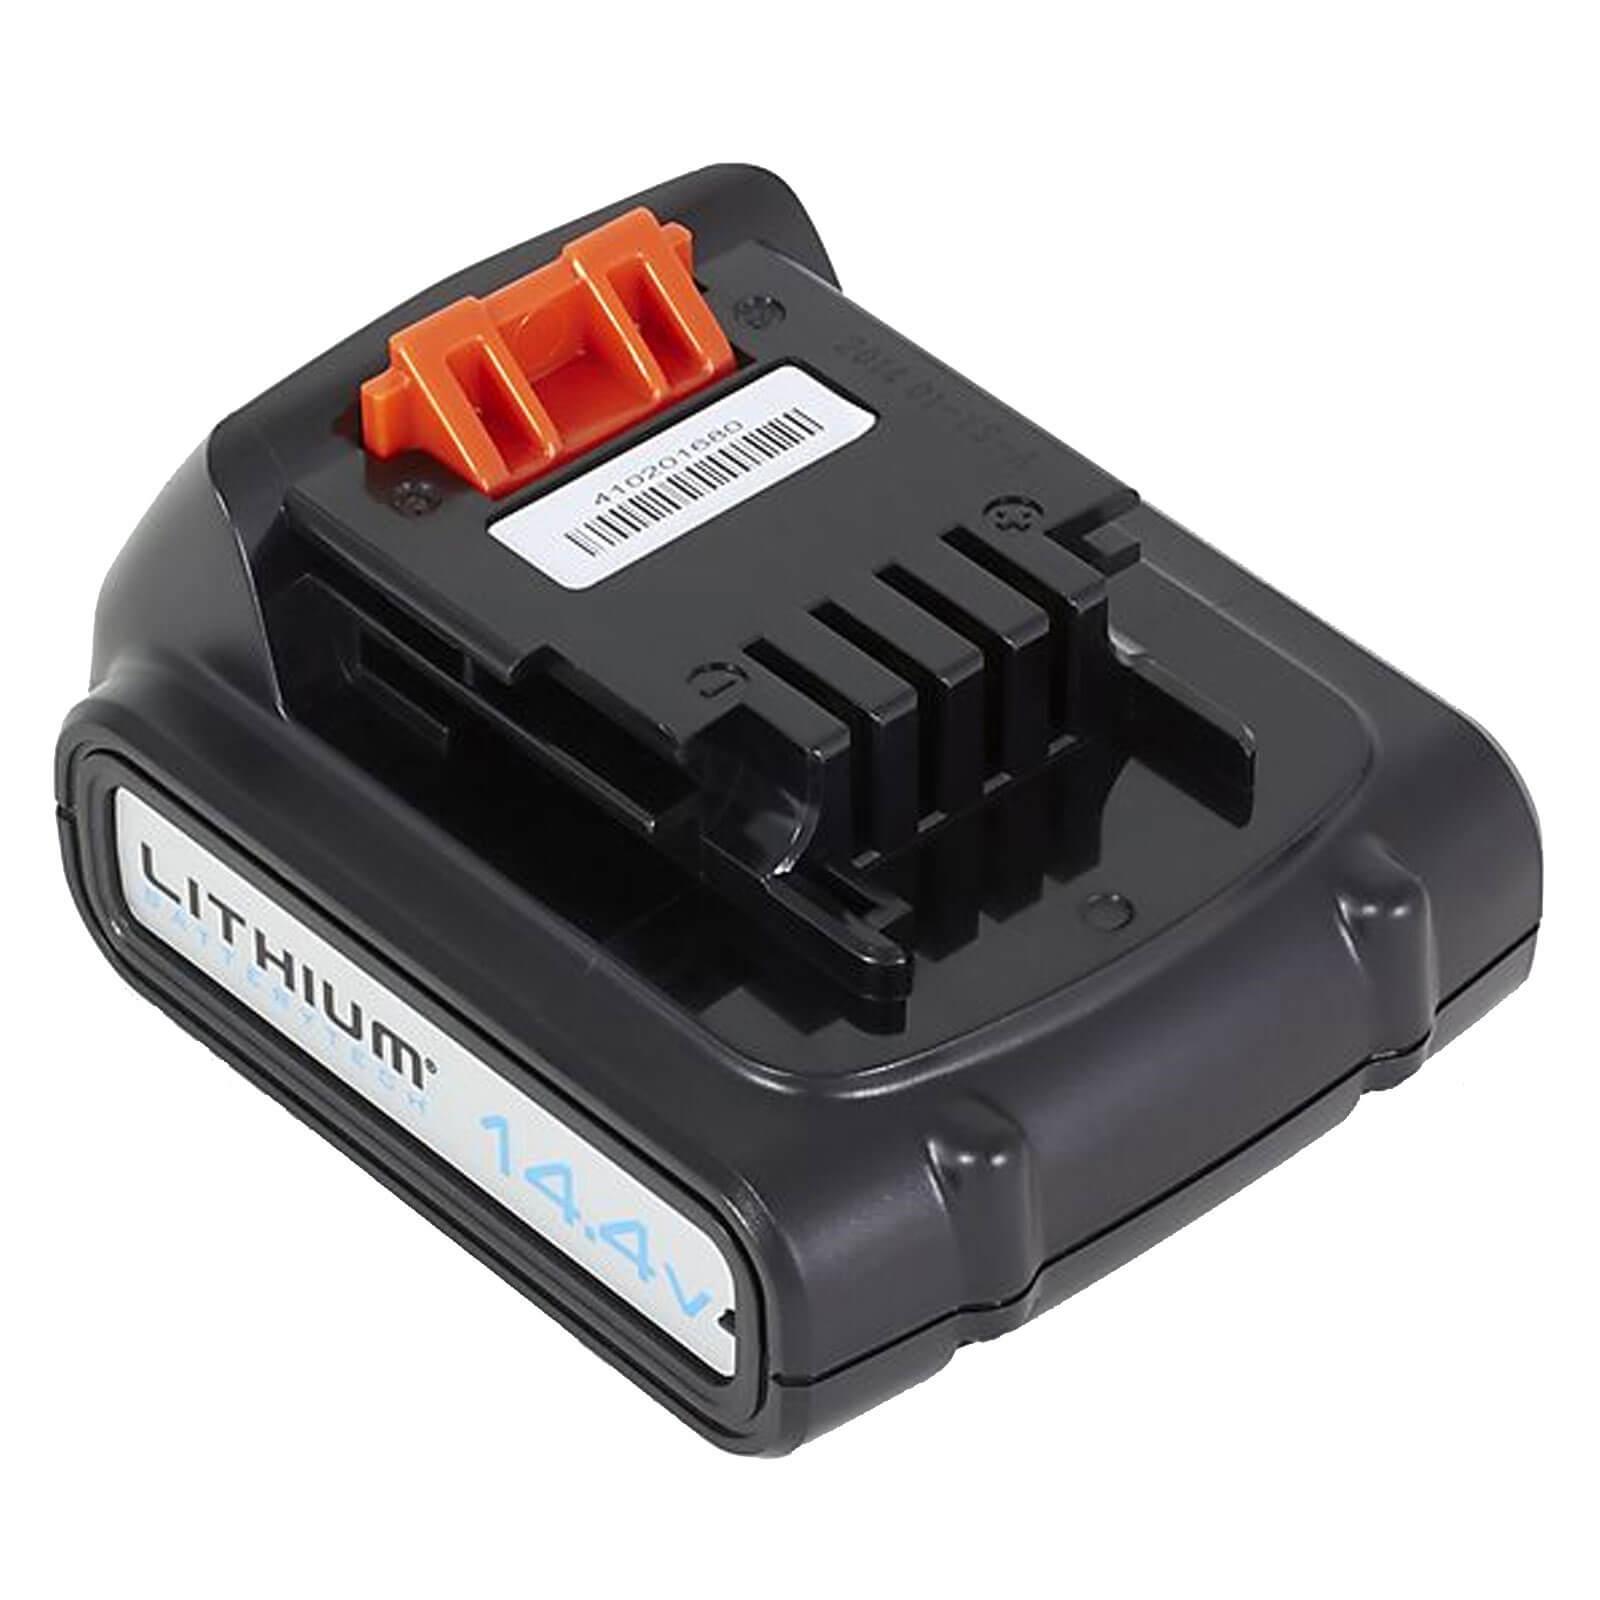 Image of Black & Decker Genuine BL1514 14.4v Cordless Li-ion Battery 1.5ah 1.5ah